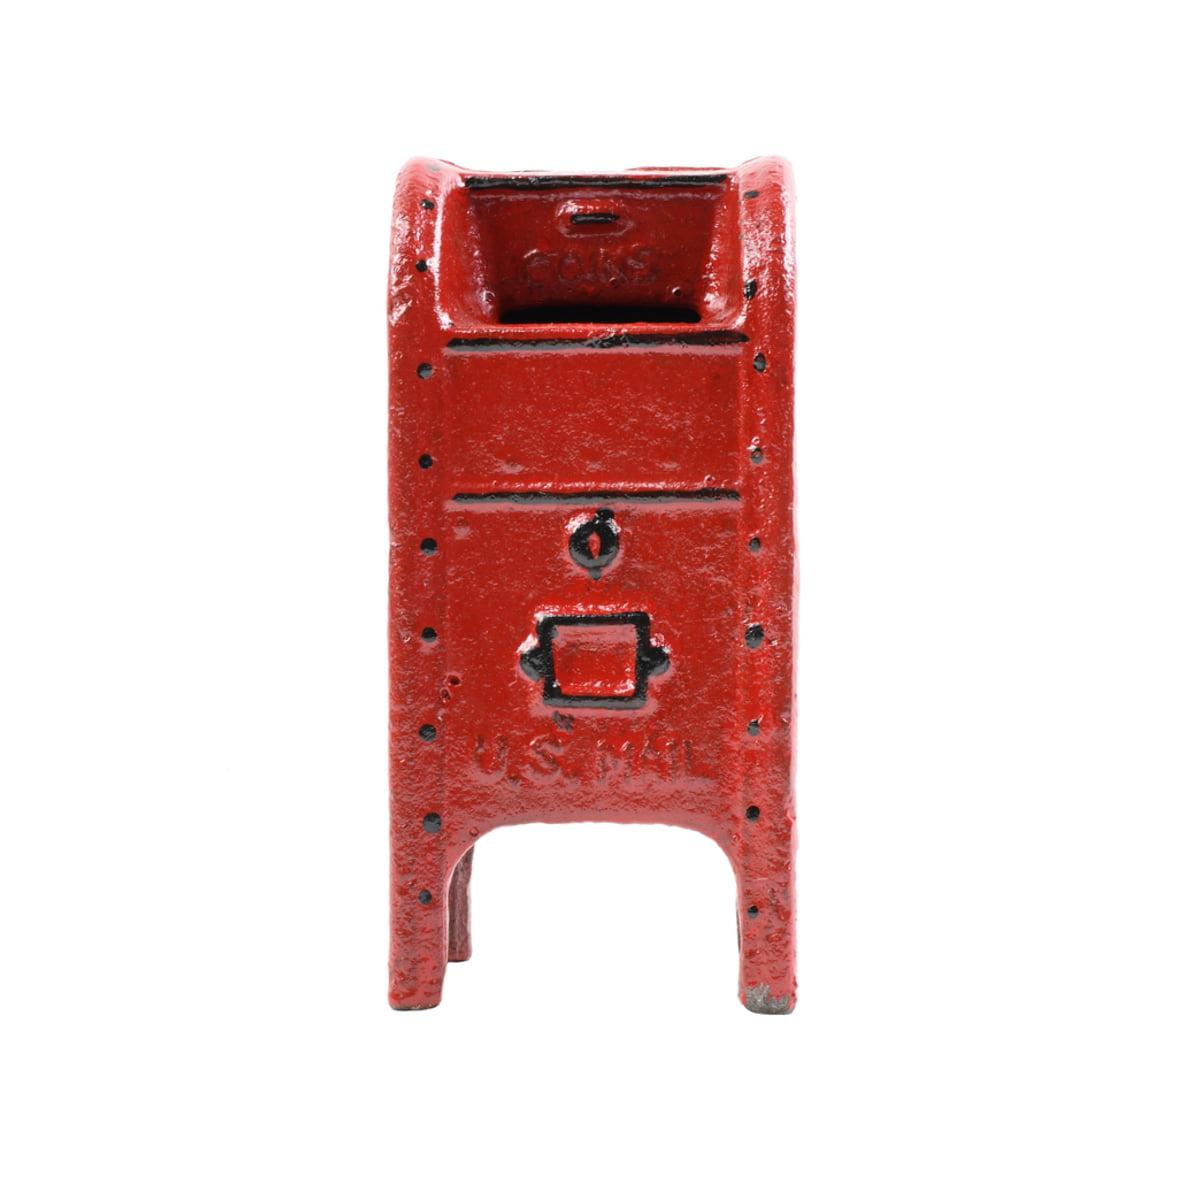 Vintage Style Cast Iron Red Mailbox Coin Piggy Bank Metal Mail Box Antique Home Decor Walmart Com Walmart Com